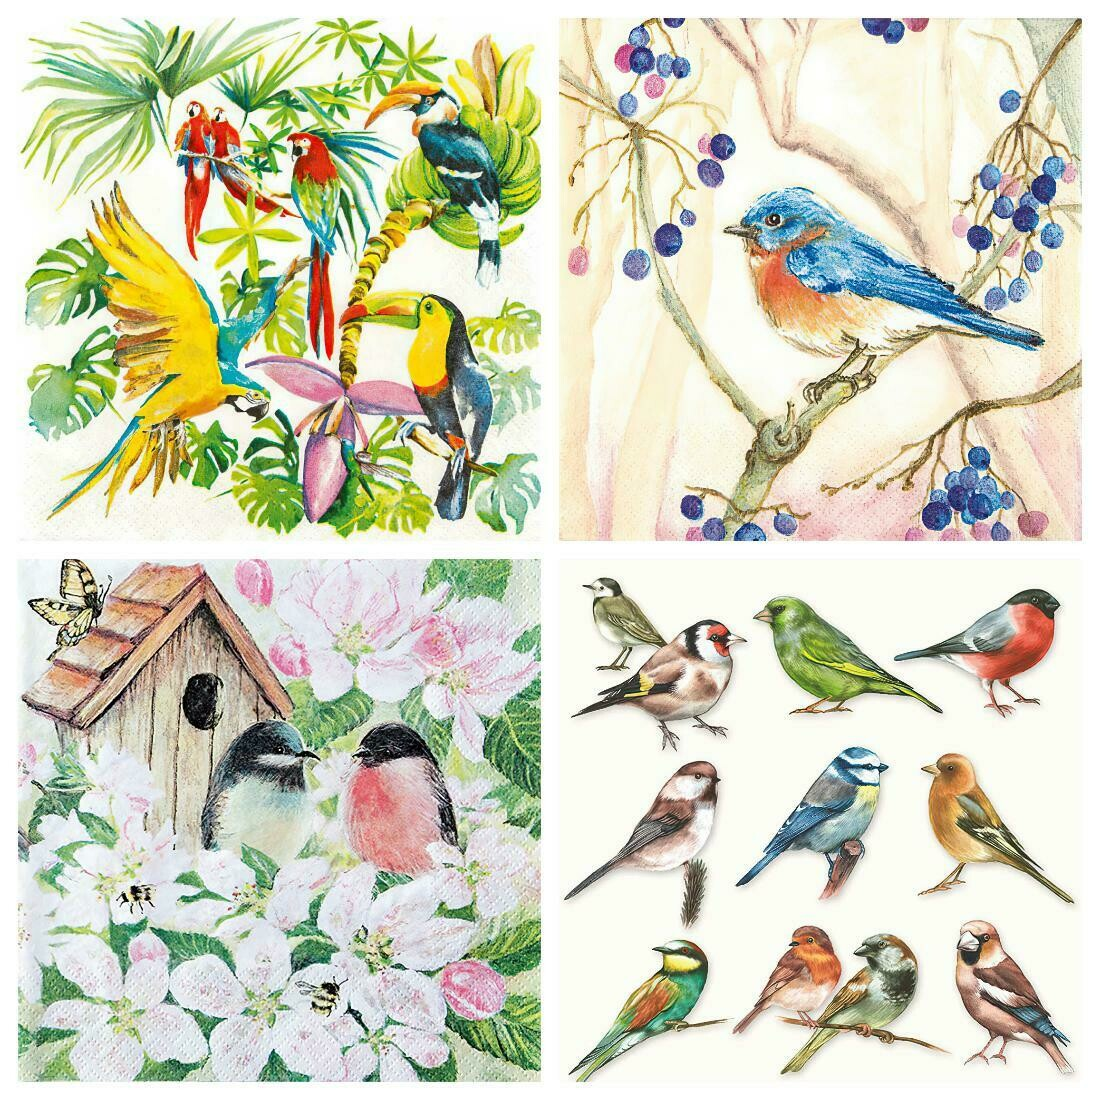 Decoupage Paper Napkins - Bird Print 10 (4 Sheets)